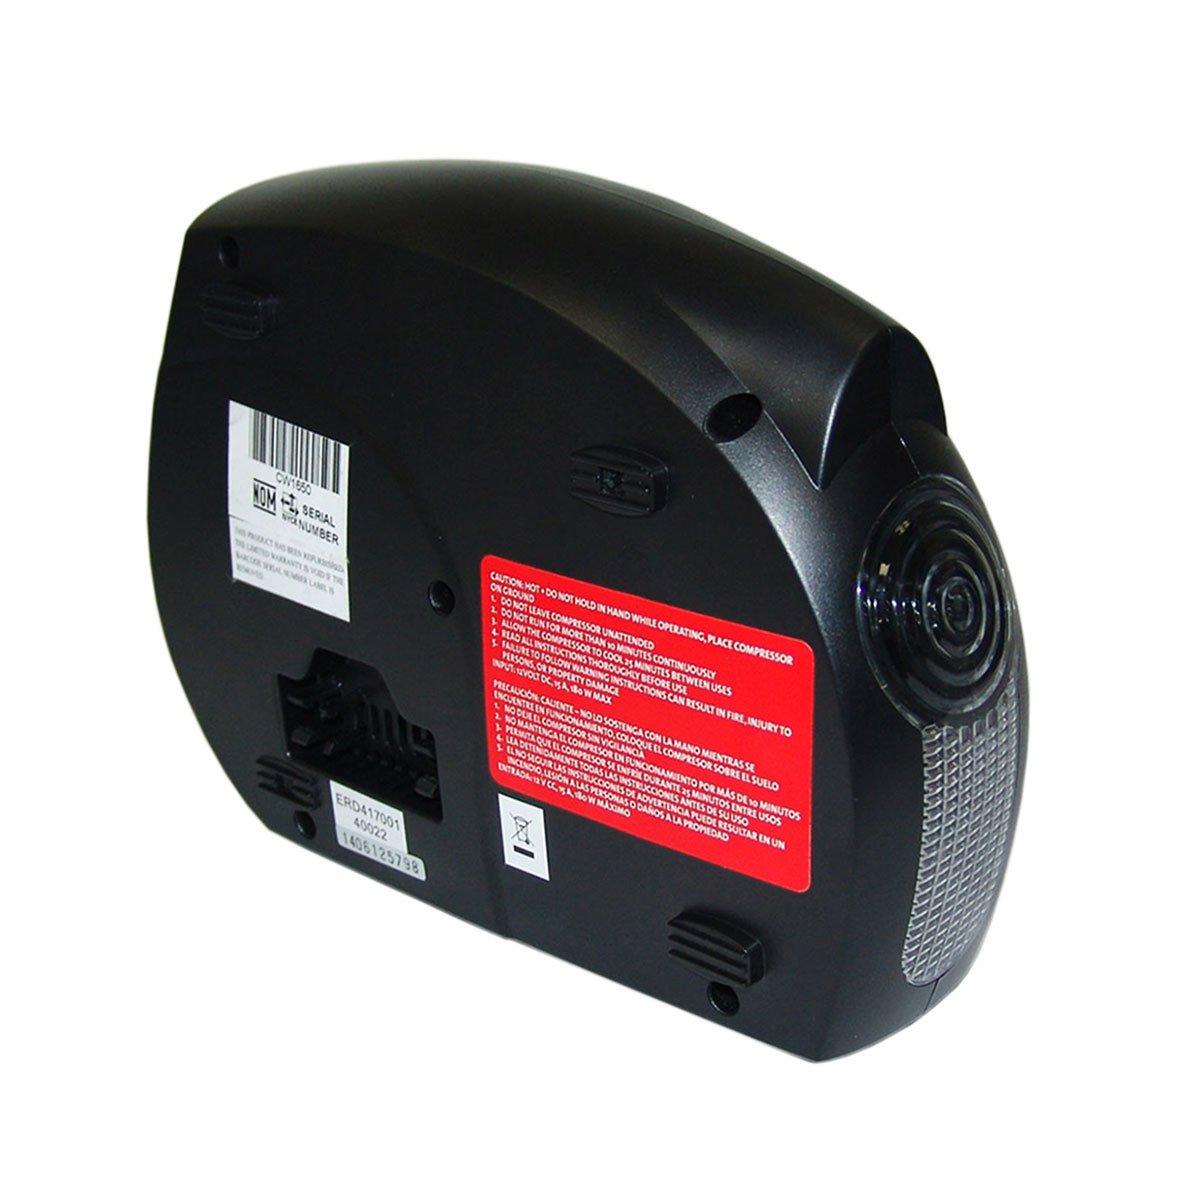 Slime 40022 12-volt digital tire inflator review youtube.